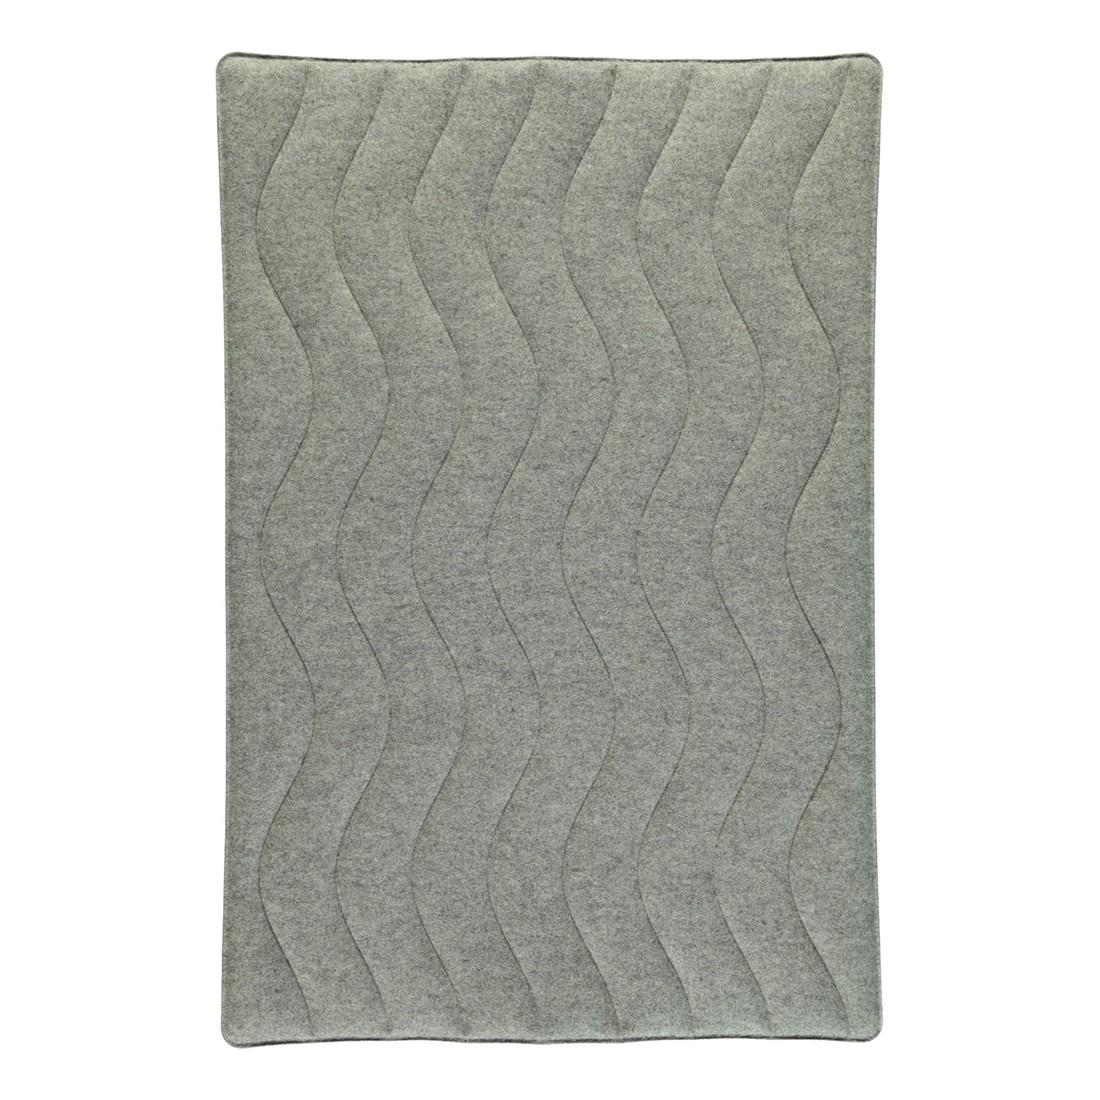 Badteppich Feel – 100% Filz kiesel meliert/- Anthrazit – 1174 – 50 x 60 cm, Rhomtuft kaufen